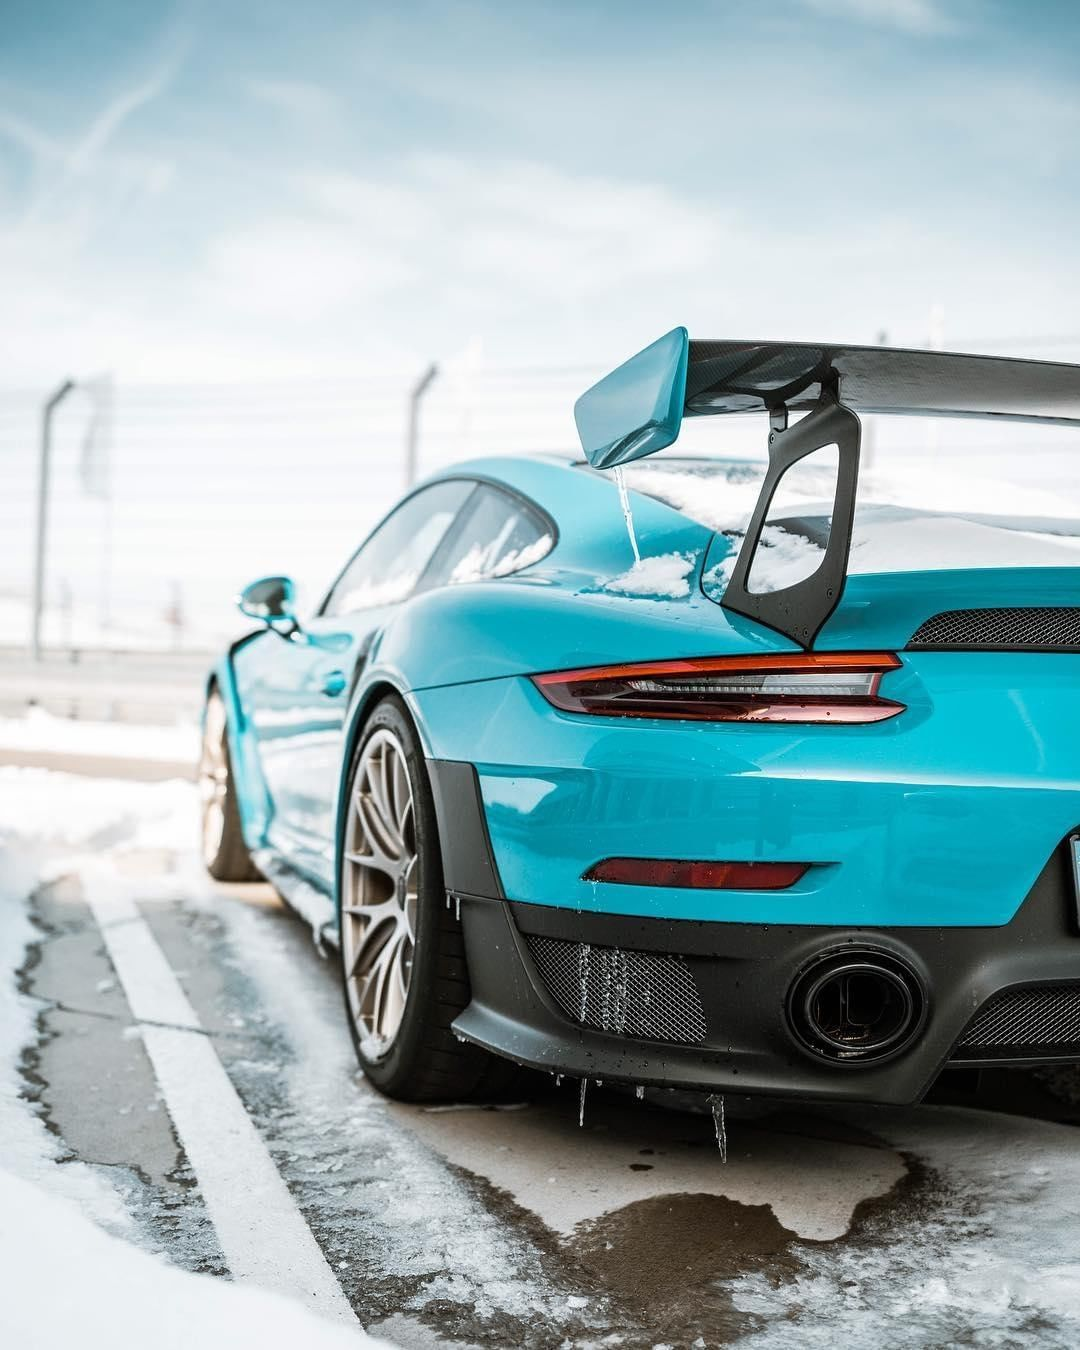 Leave Them In A Snow Storm Porschemoment Porsche911 Gt2rs Timelessmachine Sebastiankubatz Combined Fuel Co Super Sport Cars Porsche 911 Porsche